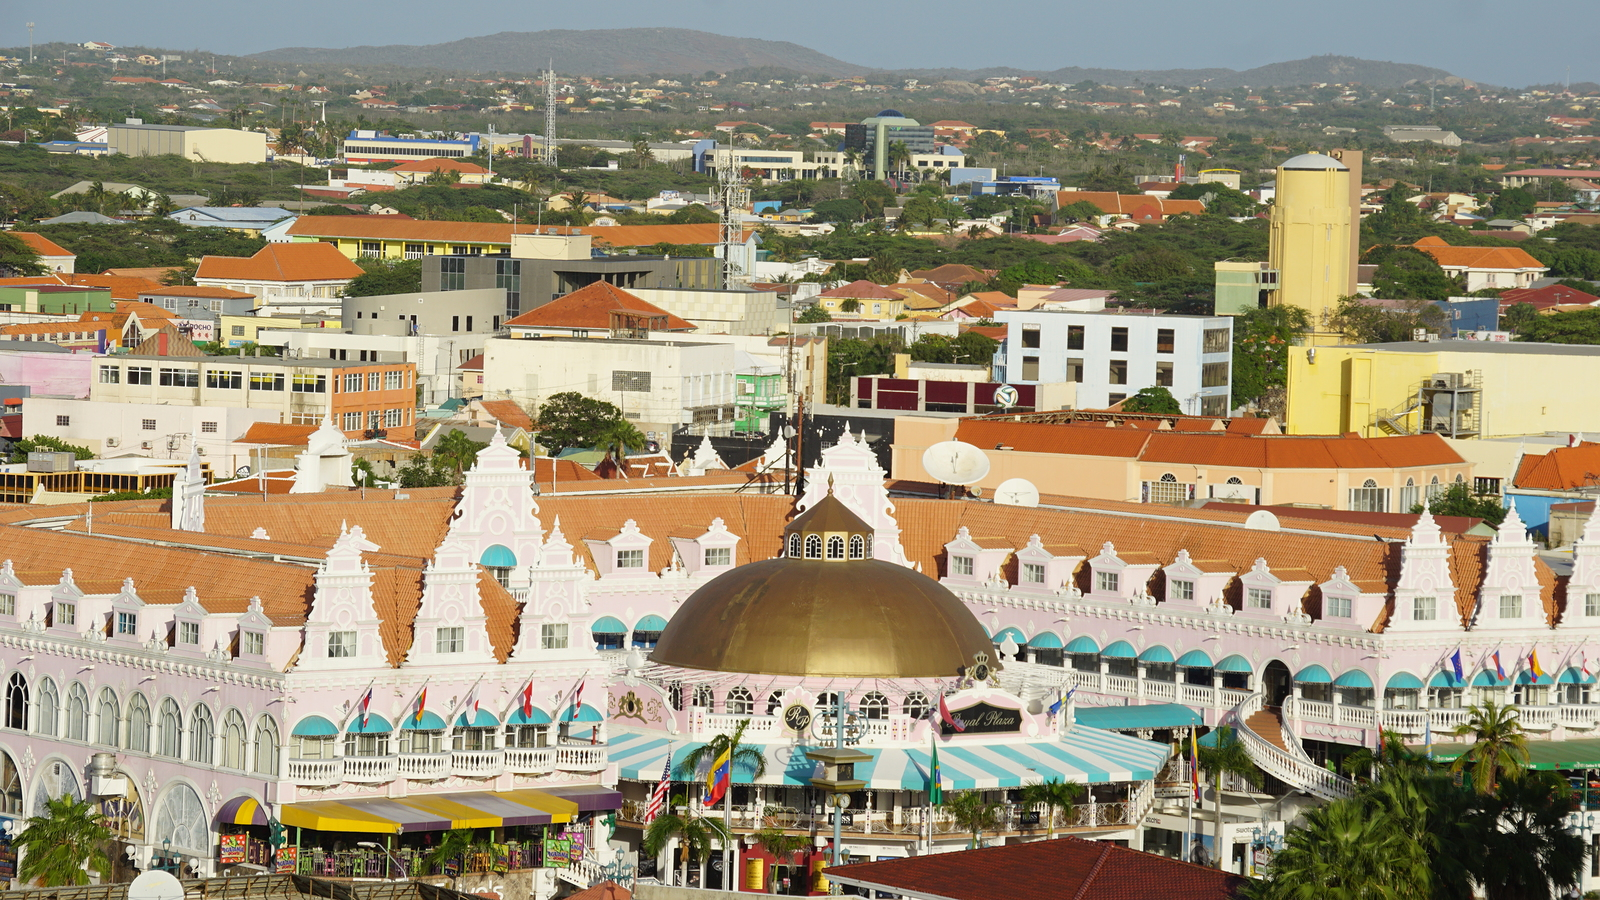 Aruba: Lighthouse interpretarion services